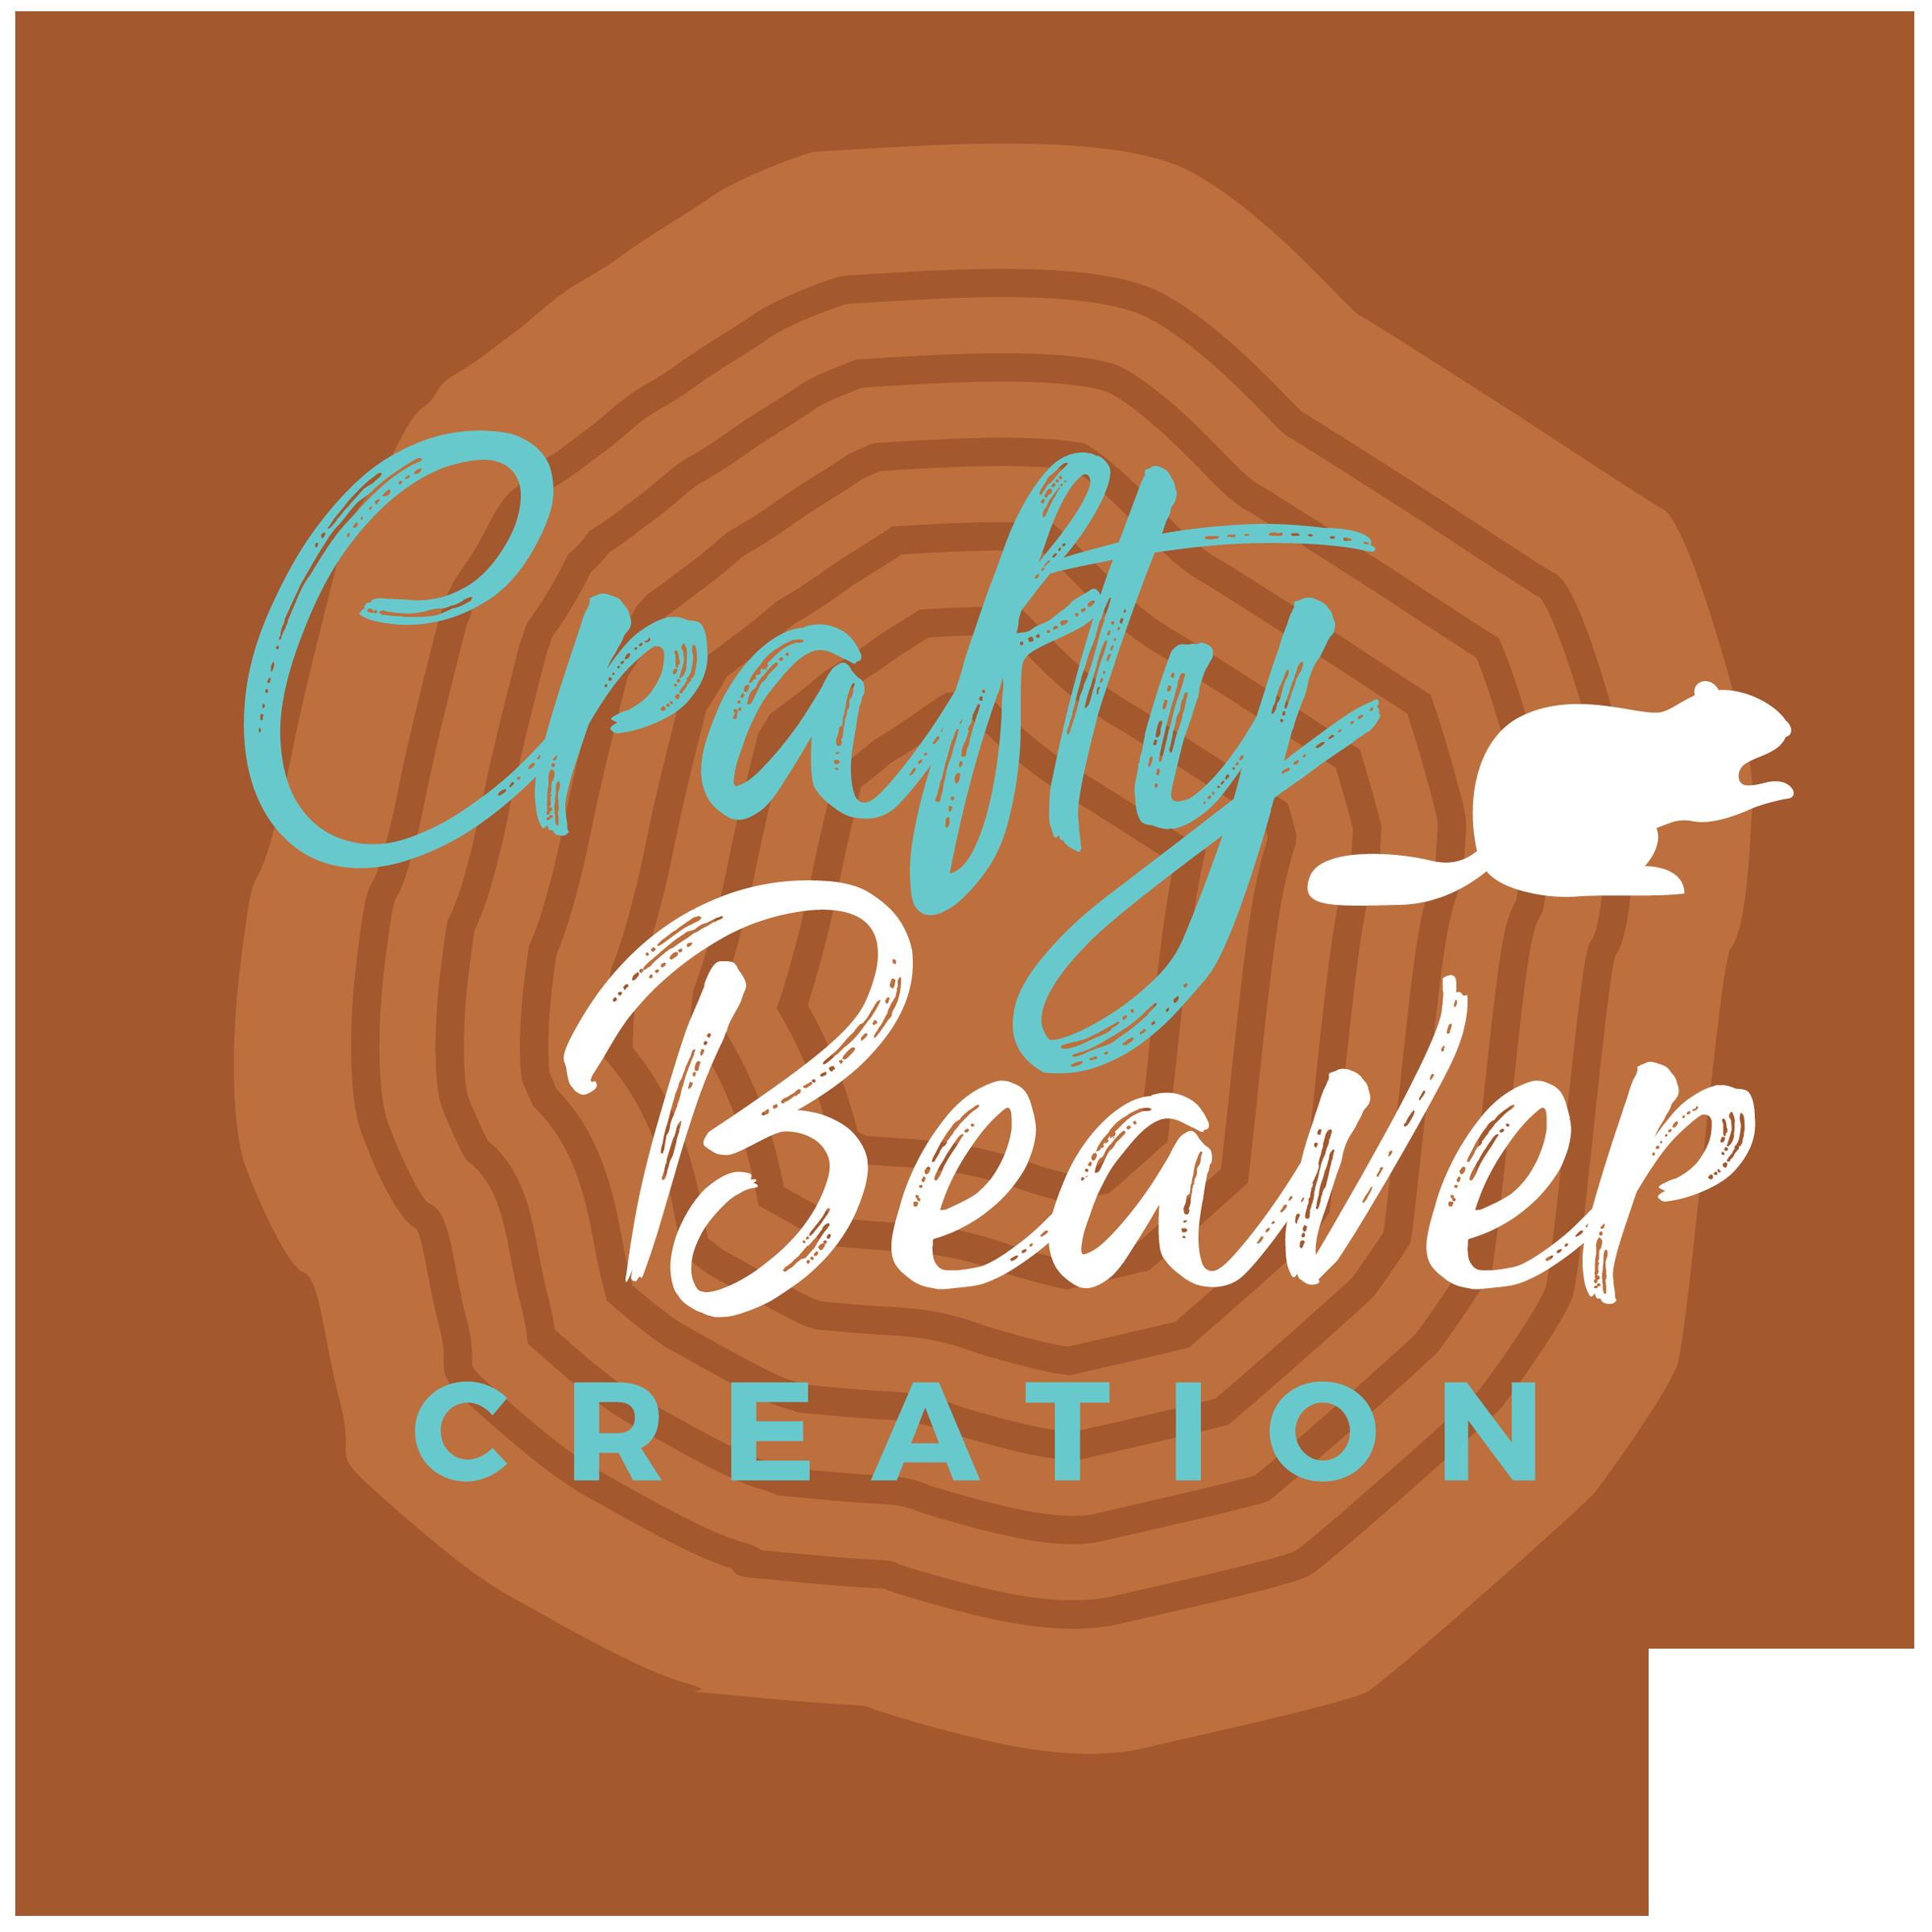 CraftyBeaverCreations_logo_FINAL.png